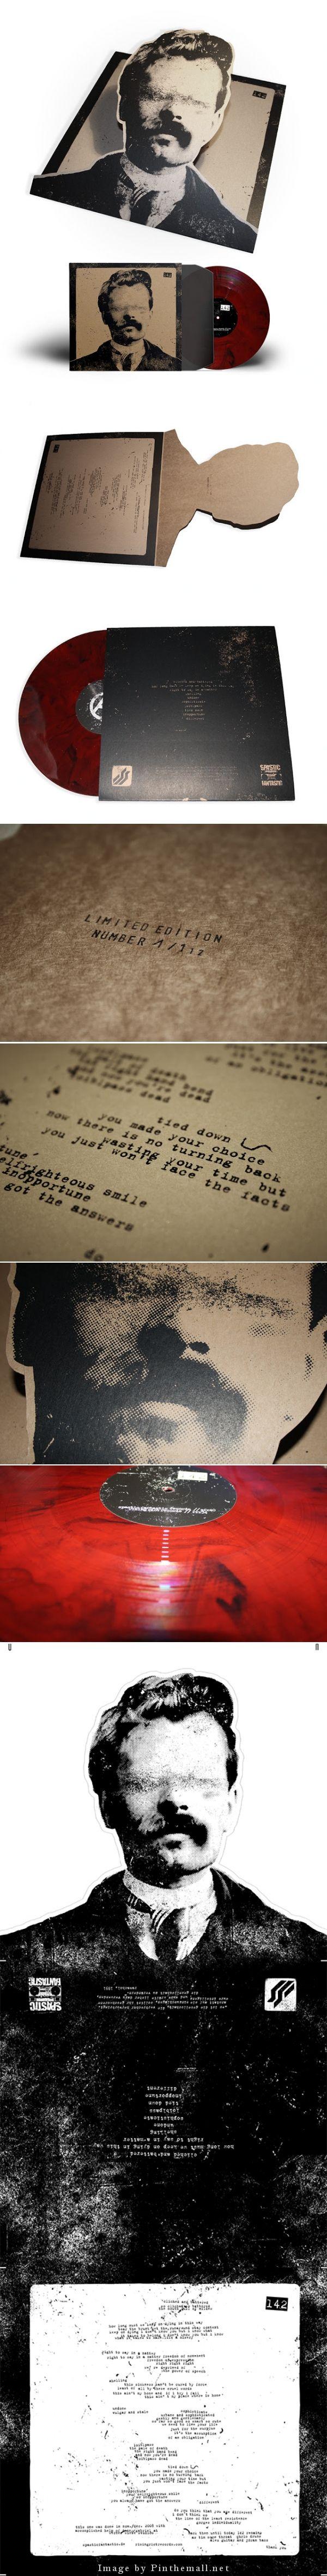 142 - Demo LP Packaging (Concept) Designer: Marcel Richard - See more at: http://www.packagingoftheworld.com/